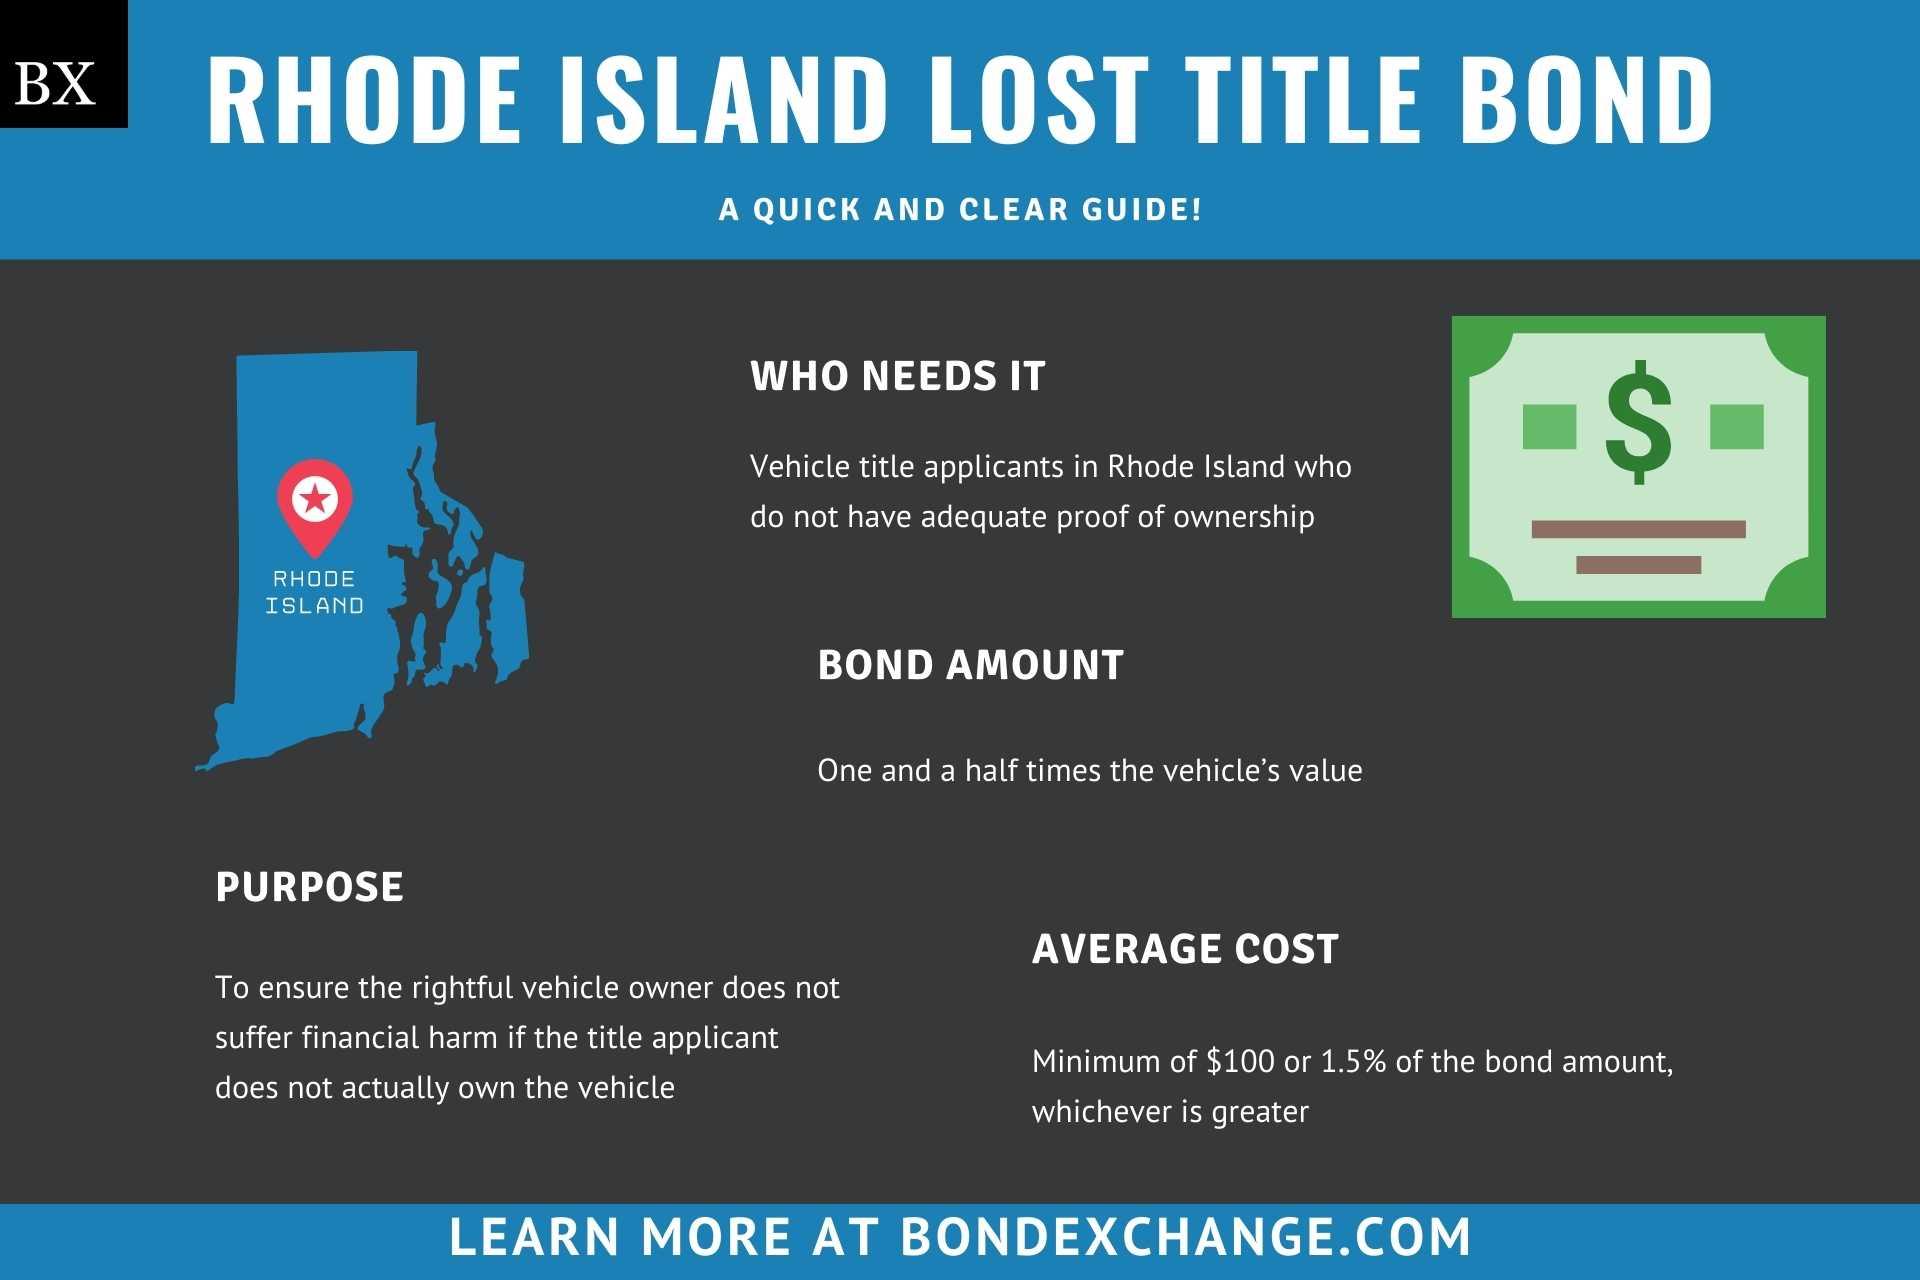 Rhode Island Lost Title Bond